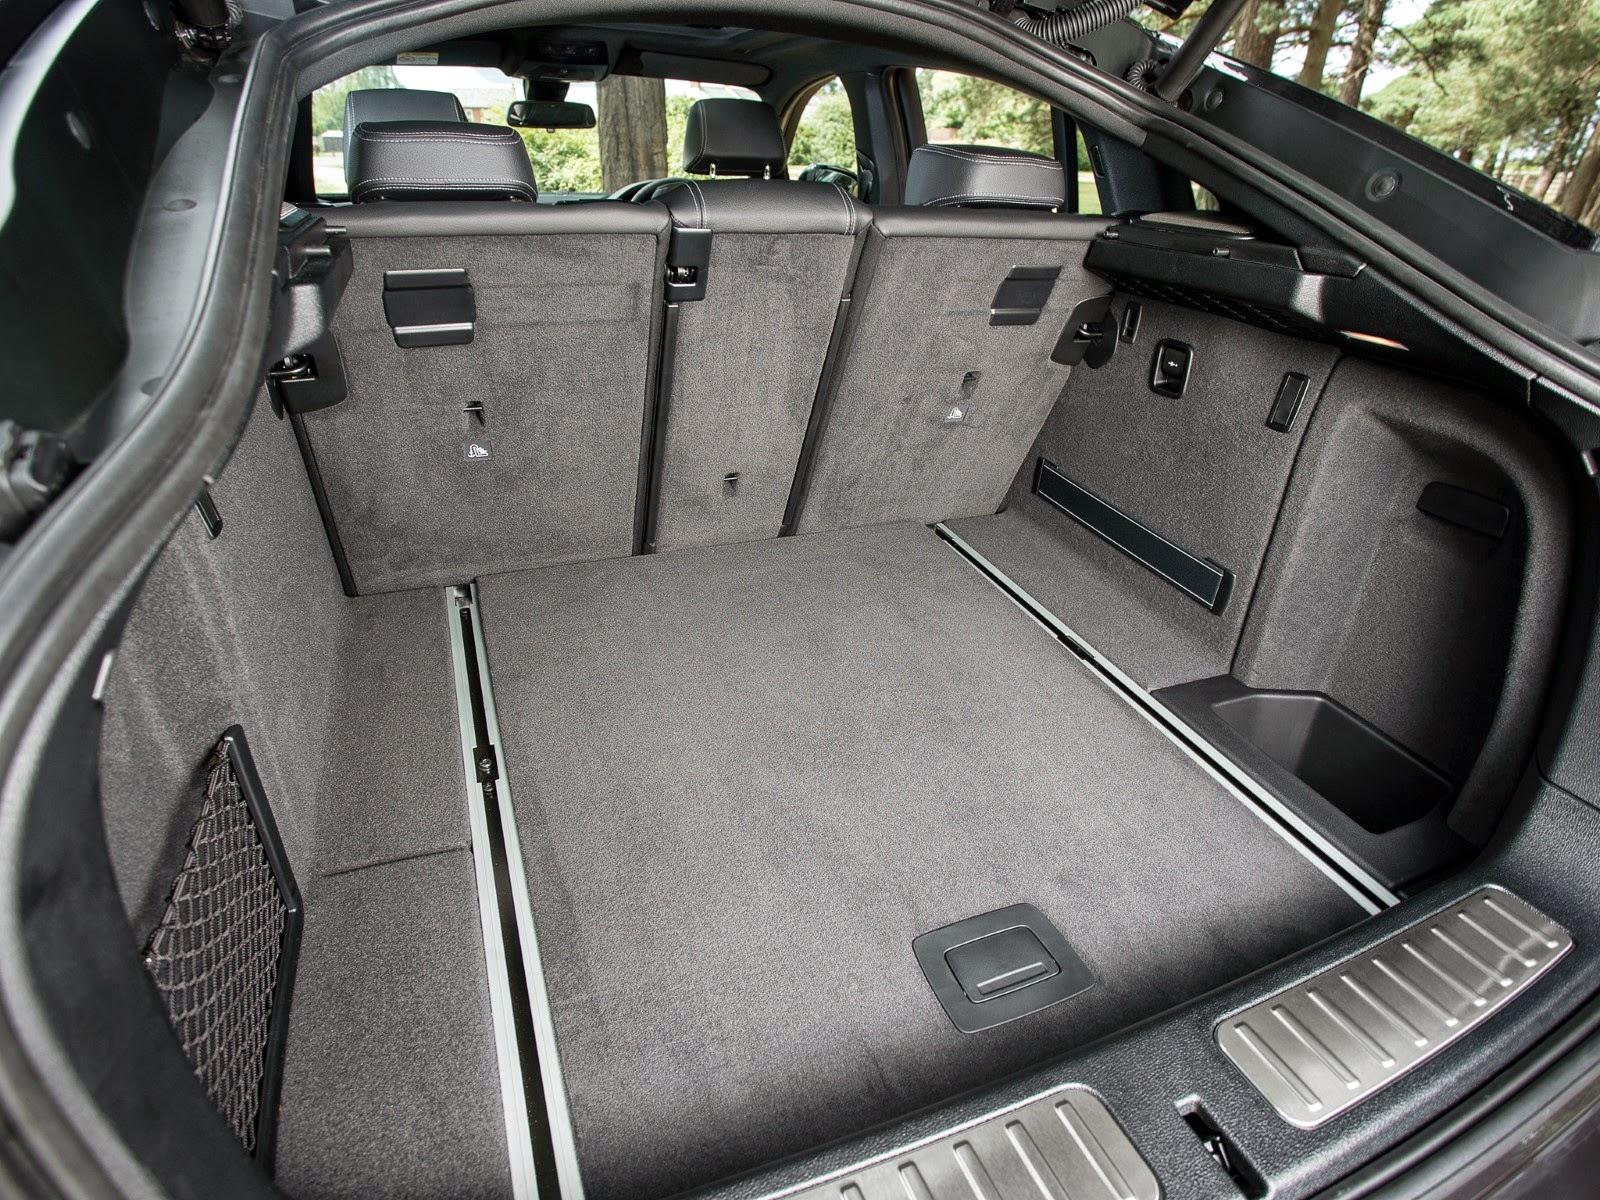 Lexus lf gh concept 2011 exterior detail 49 of 49 1600x1200 - Rear Storage